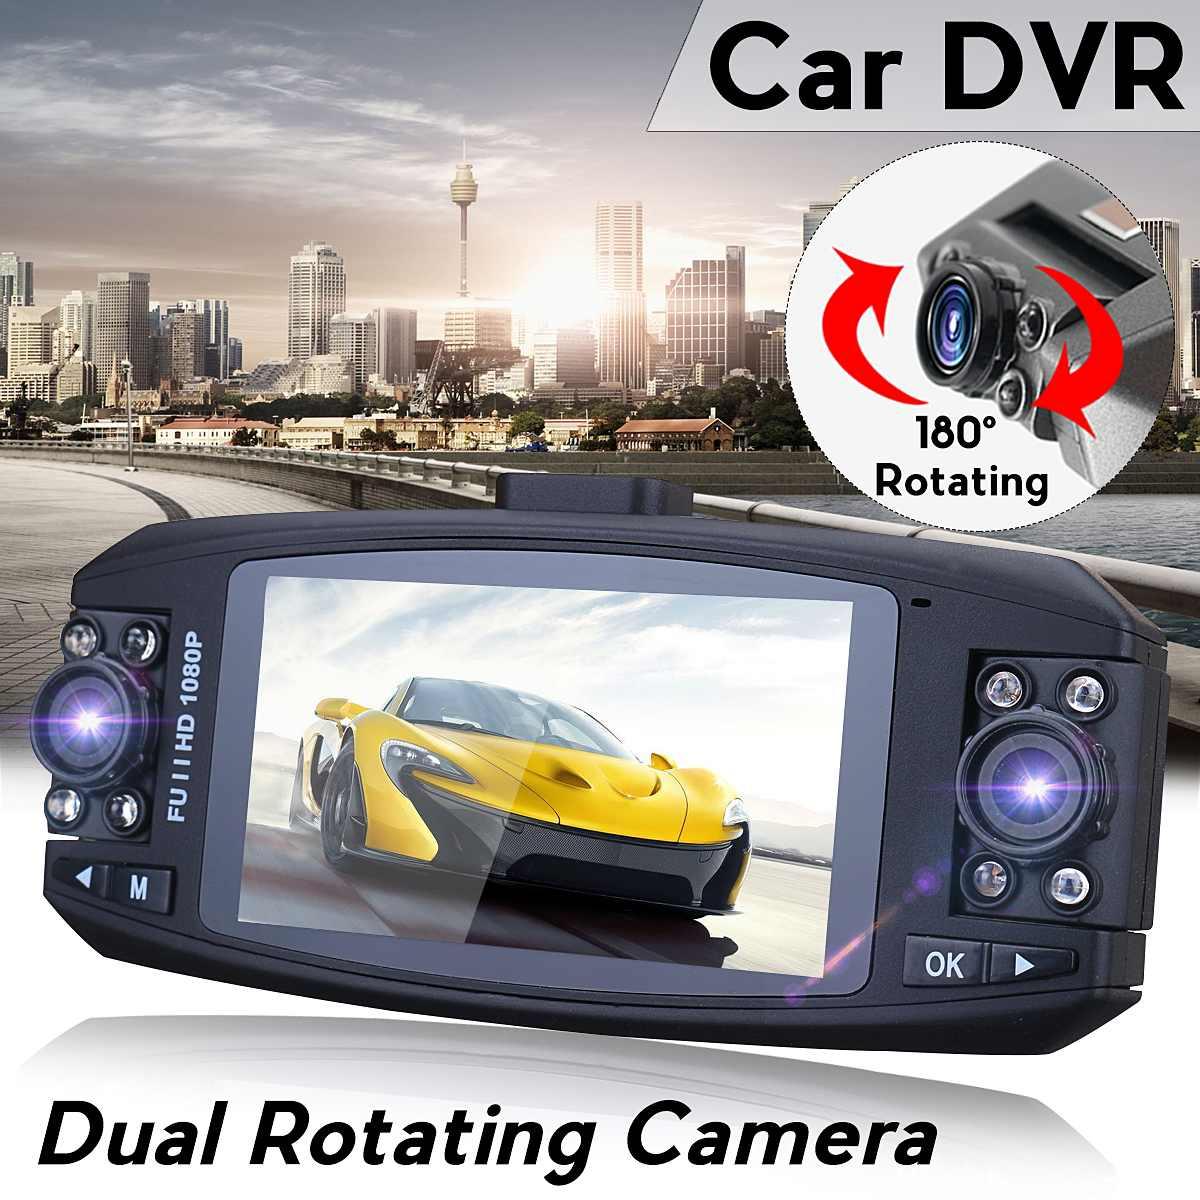 FHD 1080P Dual Lens Auto Car DVR Camera Rotating Dash Cam Vehicle Video Recorder Camera Mirror G Sensor CamcorderFHD 1080P Dual Lens Auto Car DVR Camera Rotating Dash Cam Vehicle Video Recorder Camera Mirror G Sensor Camcorder